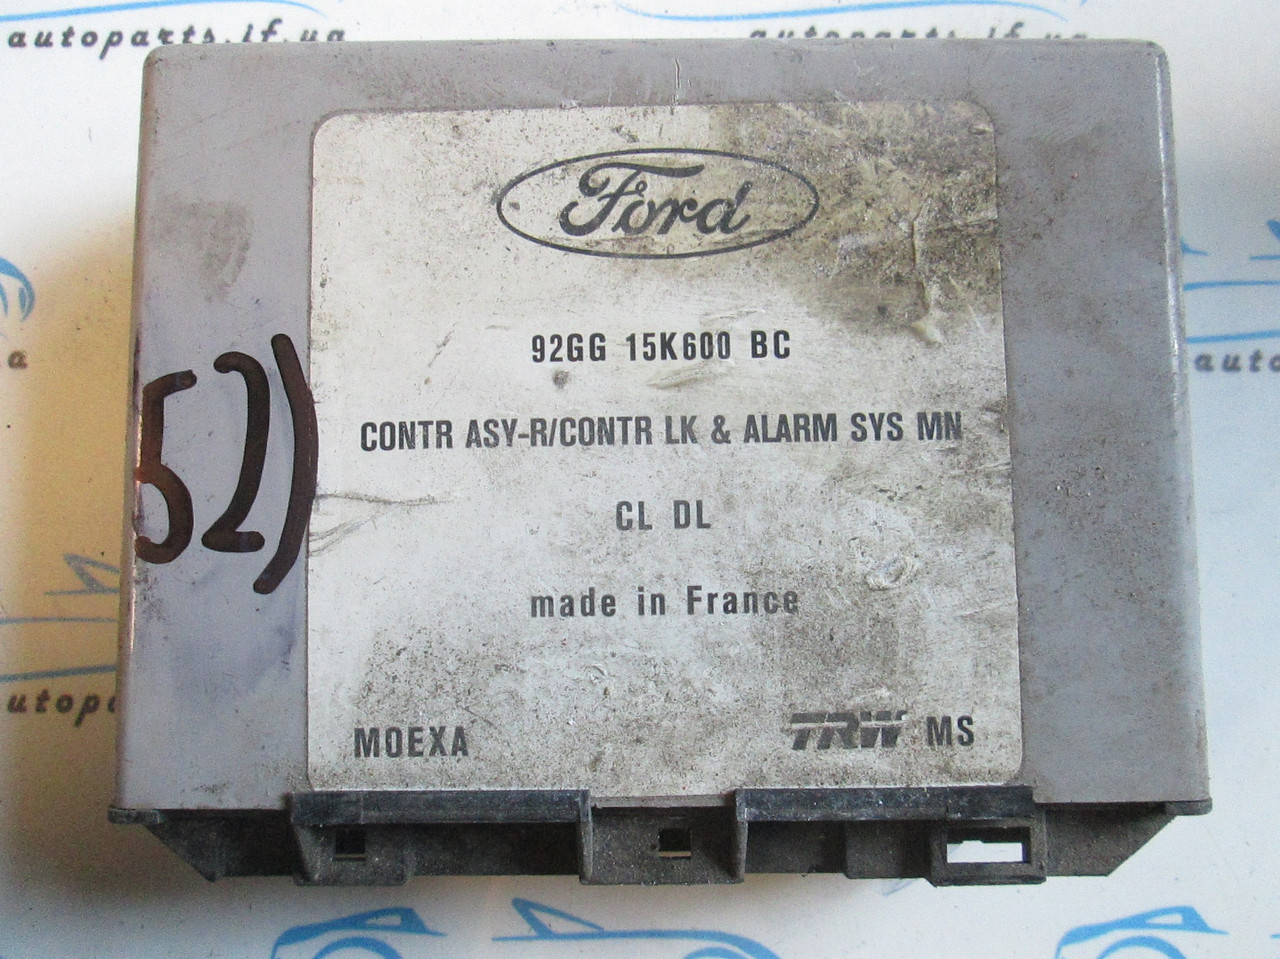 Блок управления Форд, Ford №52, 92GG15K600BC